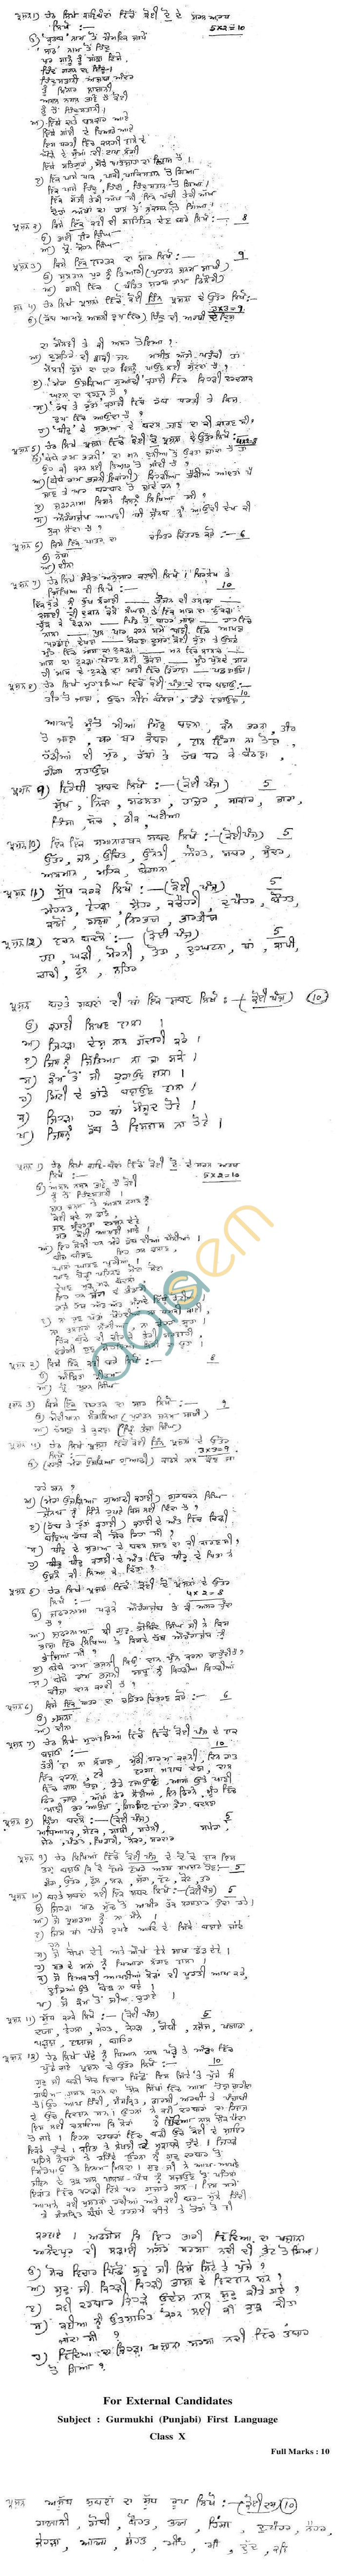 WB Board Sample Question Papers for Madhyamik Pariksha (Class 10) -Gurmukhi